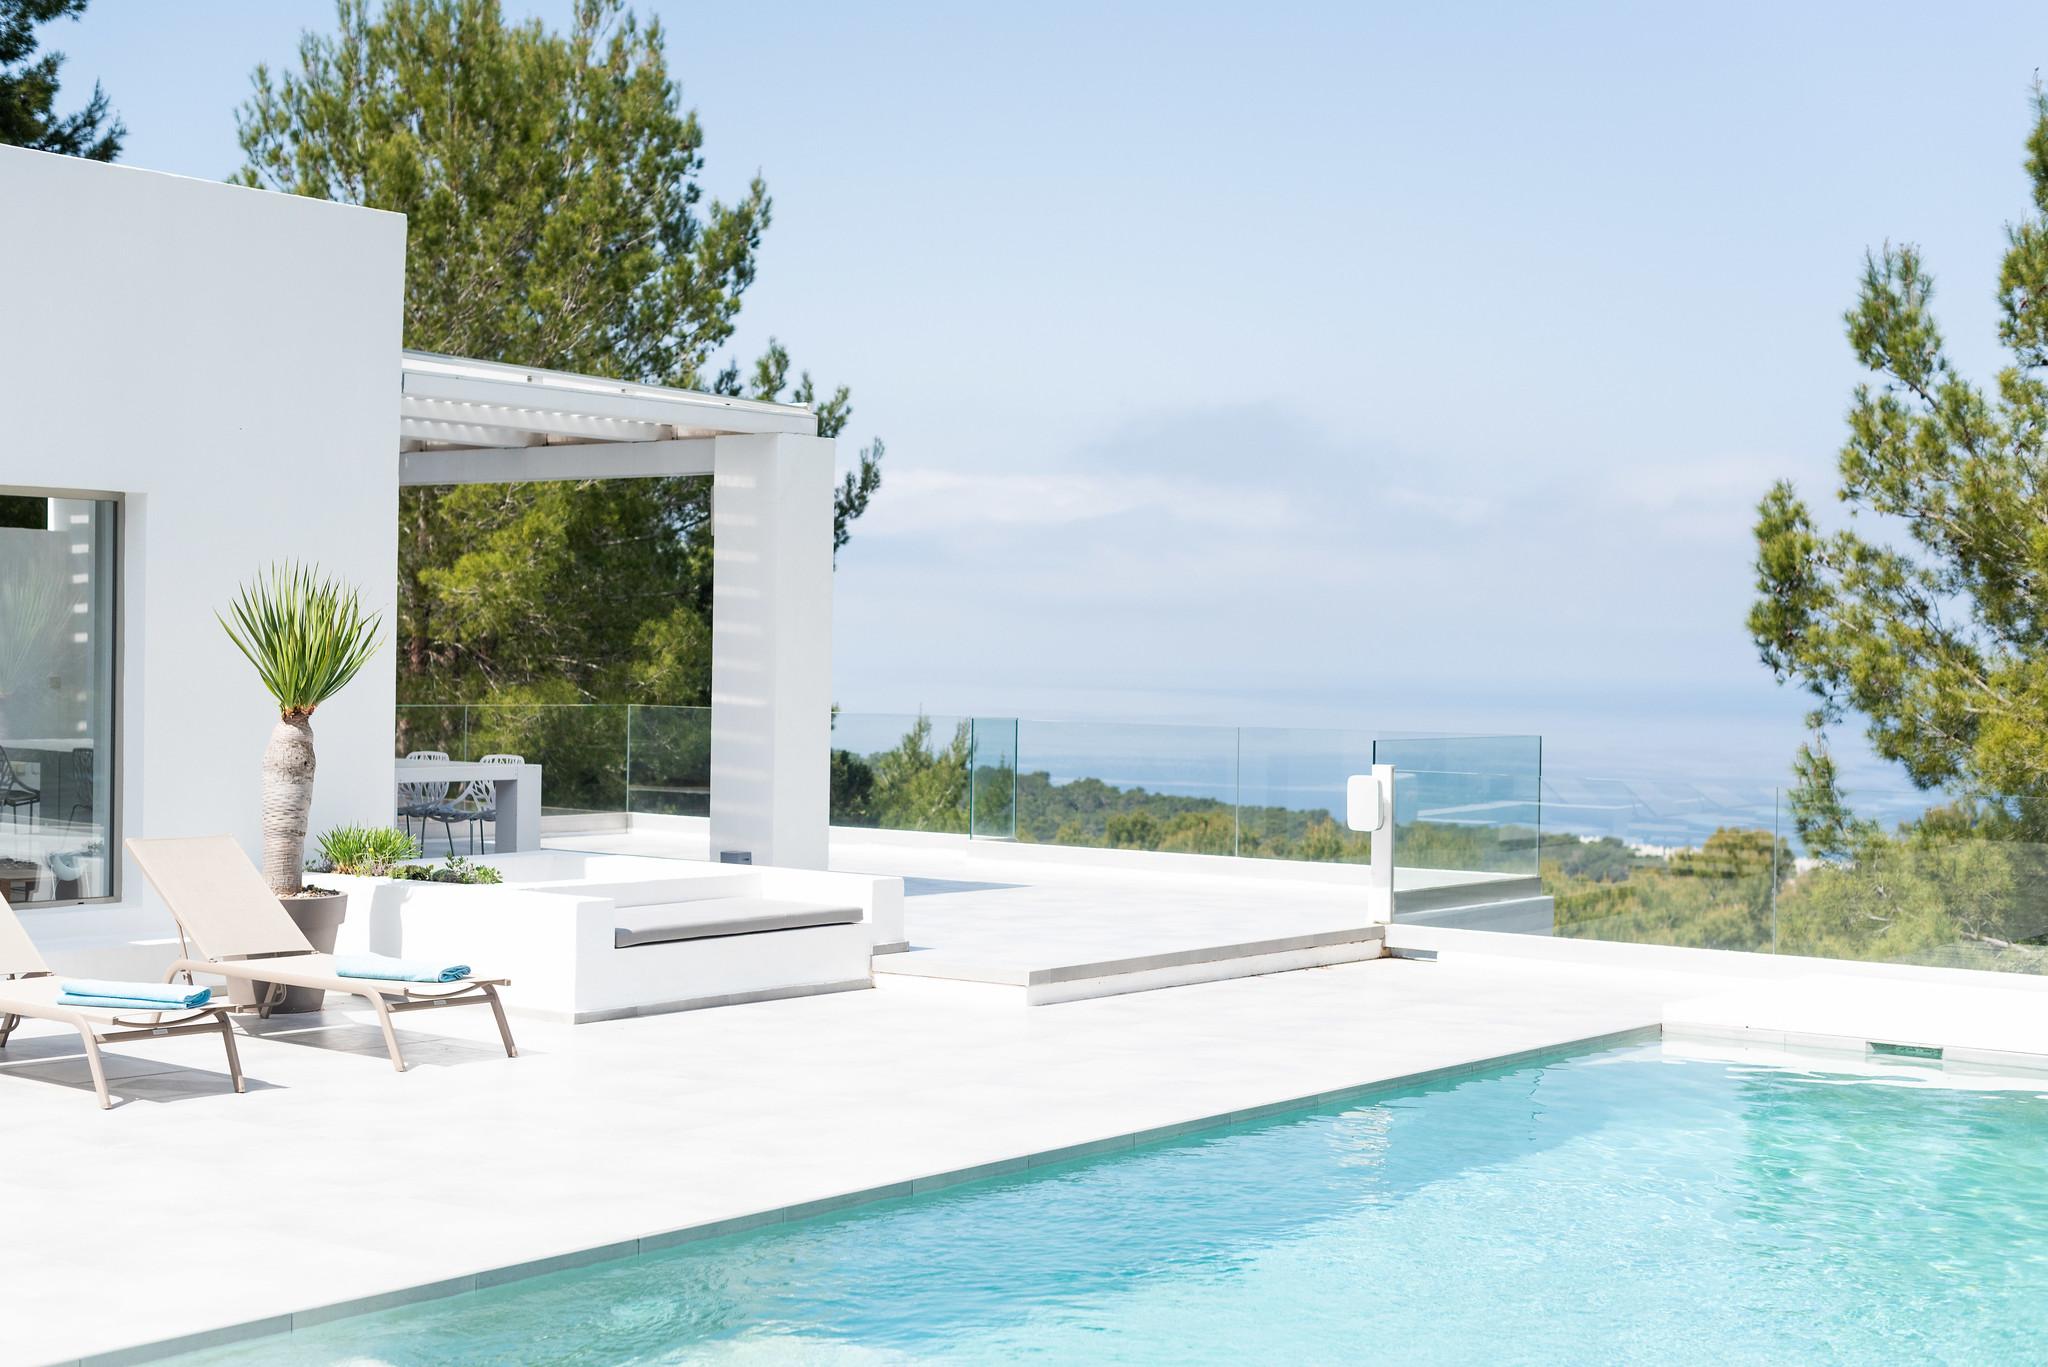 https://www.white-ibiza.com/wp-content/uploads/2020/05/white-ibiza-villas-can-dela-across-the-pool.jpg